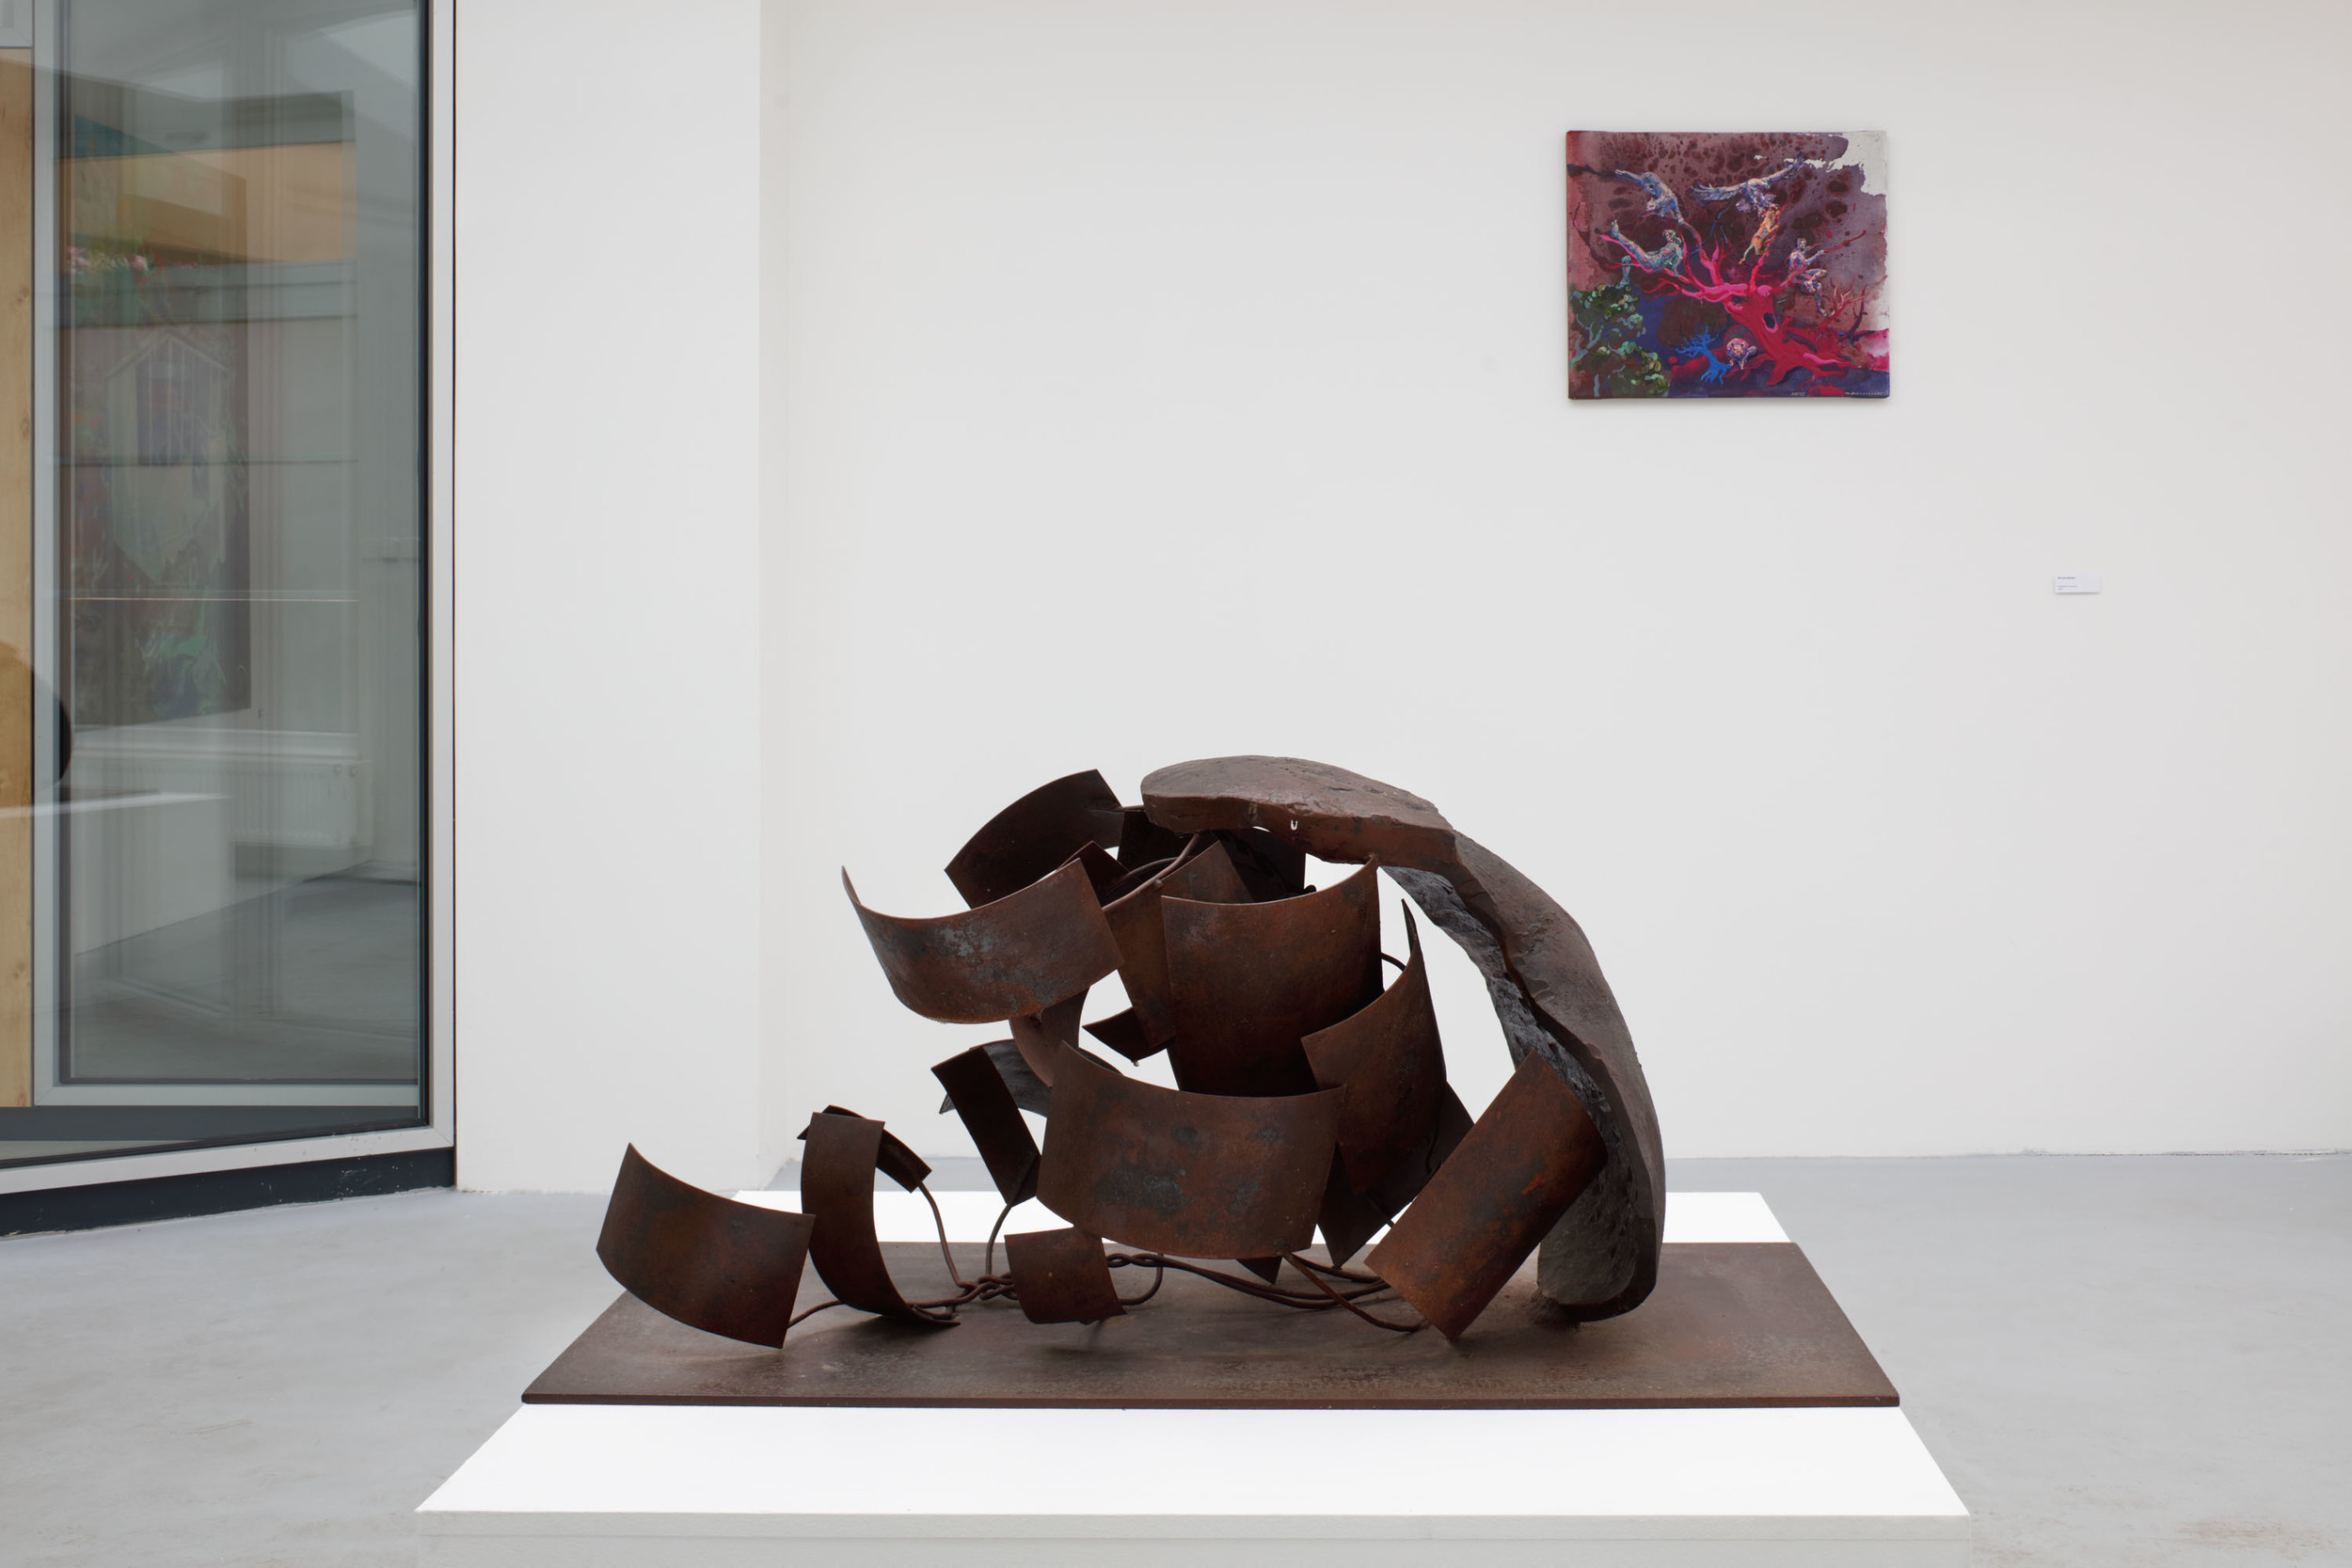 Lukáš Rittstein, Den co den ocel, 2006, kov, 100 x 50 x 45 cm